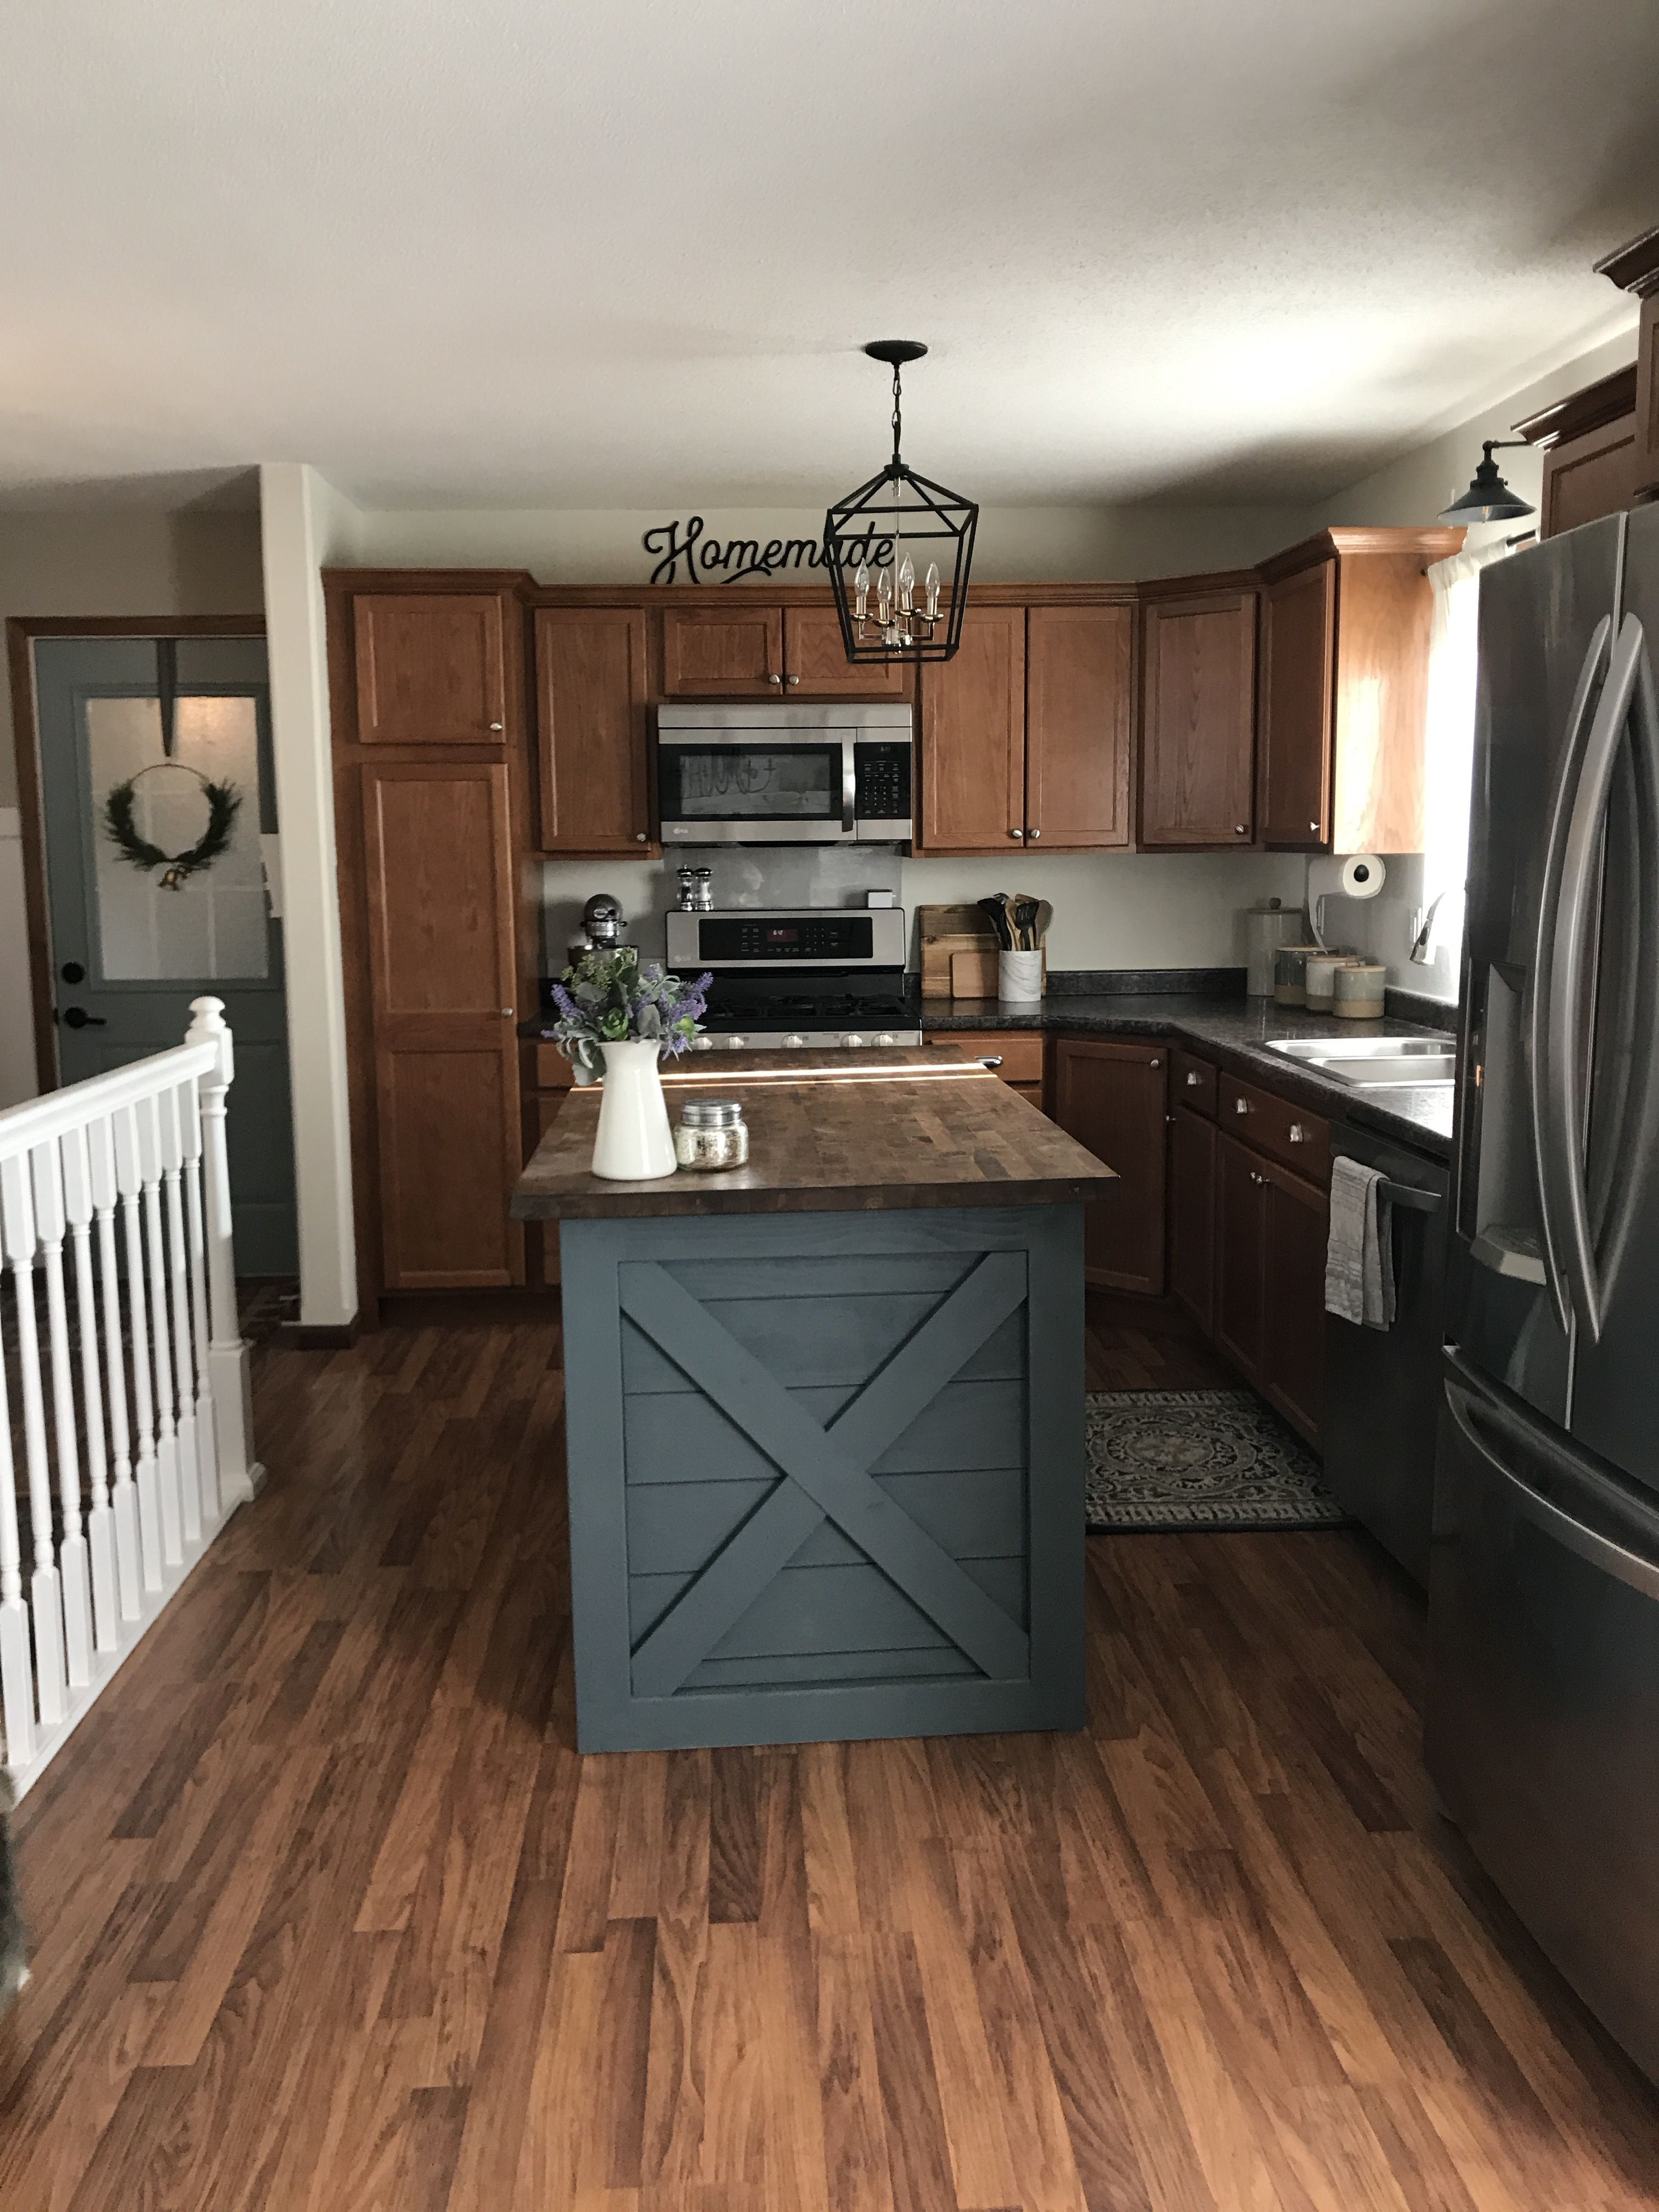 47 inspiring kitchen island ideas up style extra storage sooziq com farmhouse kitchen on kitchen island ideas diy id=17443